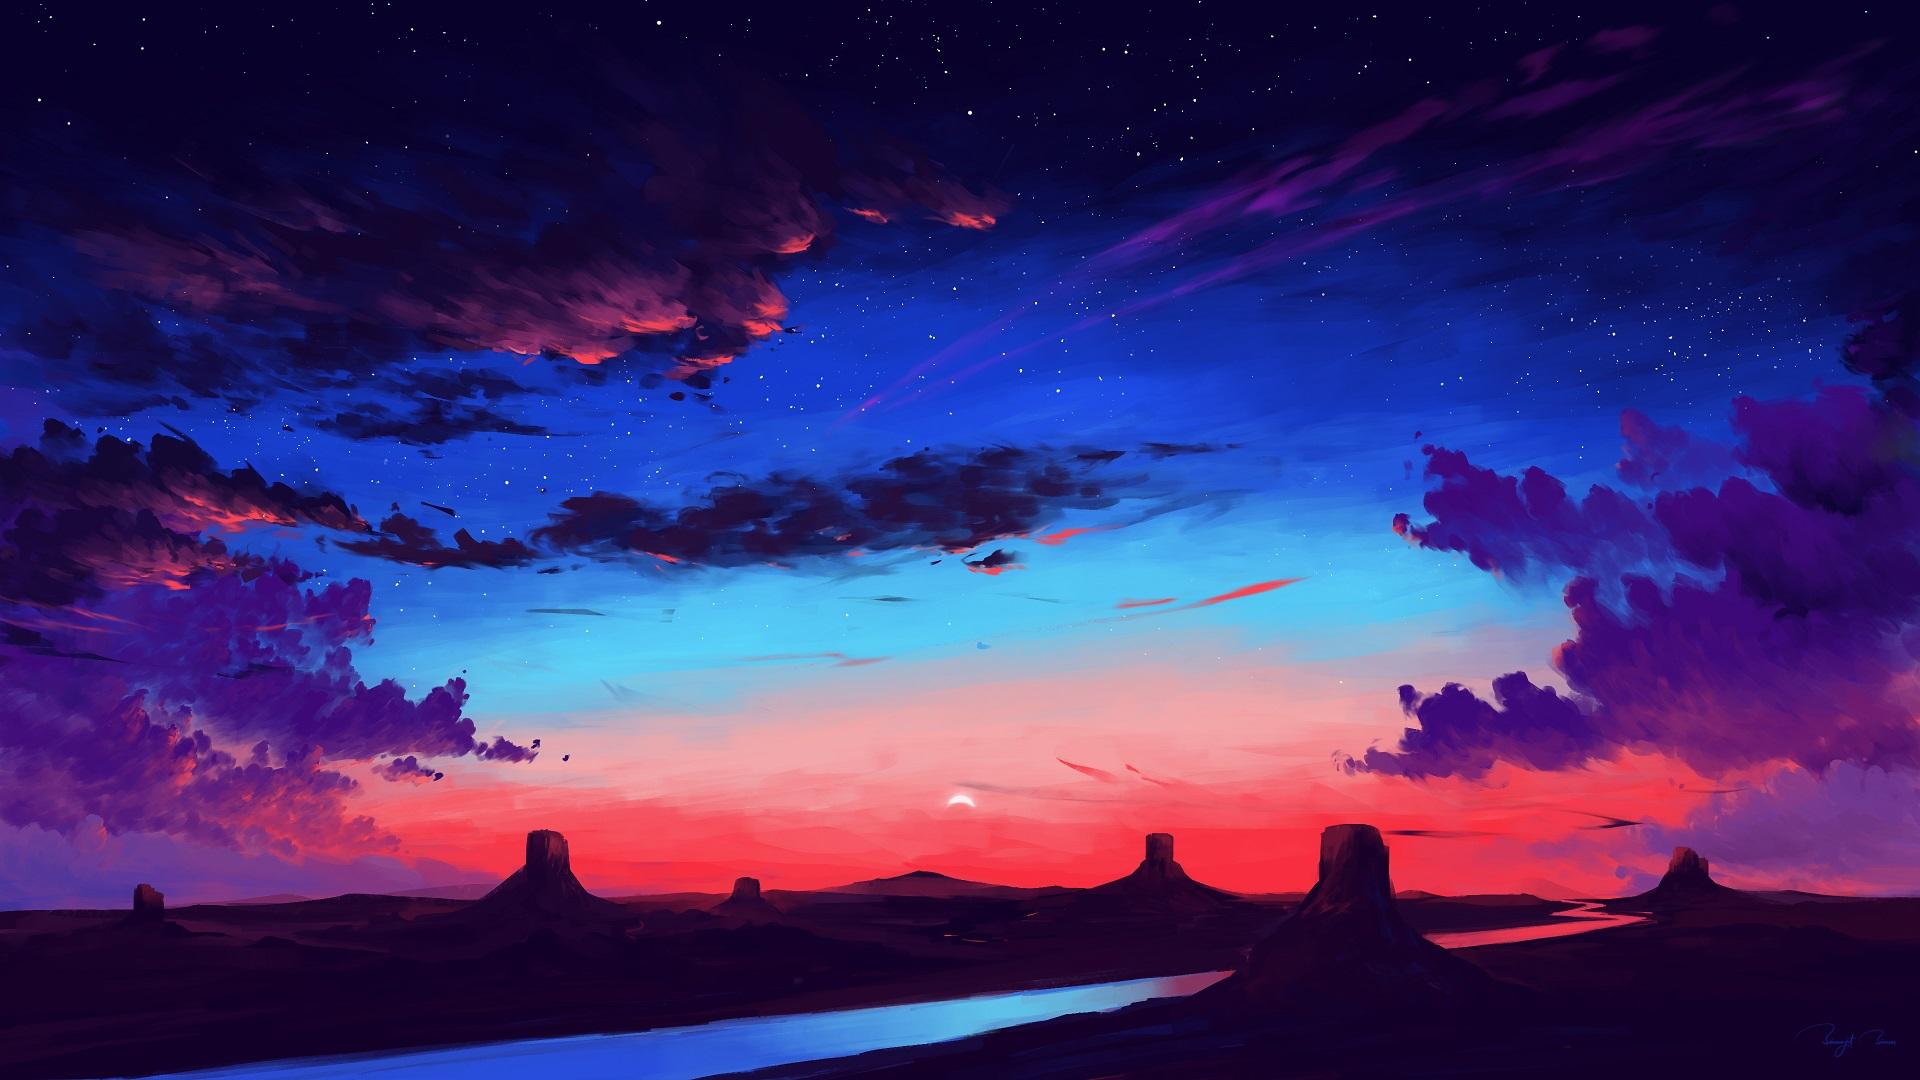 BEAUTIFUL LANDSCAPE ILLUSTRATION BACKGROUND WALLPAPER HD 1080p